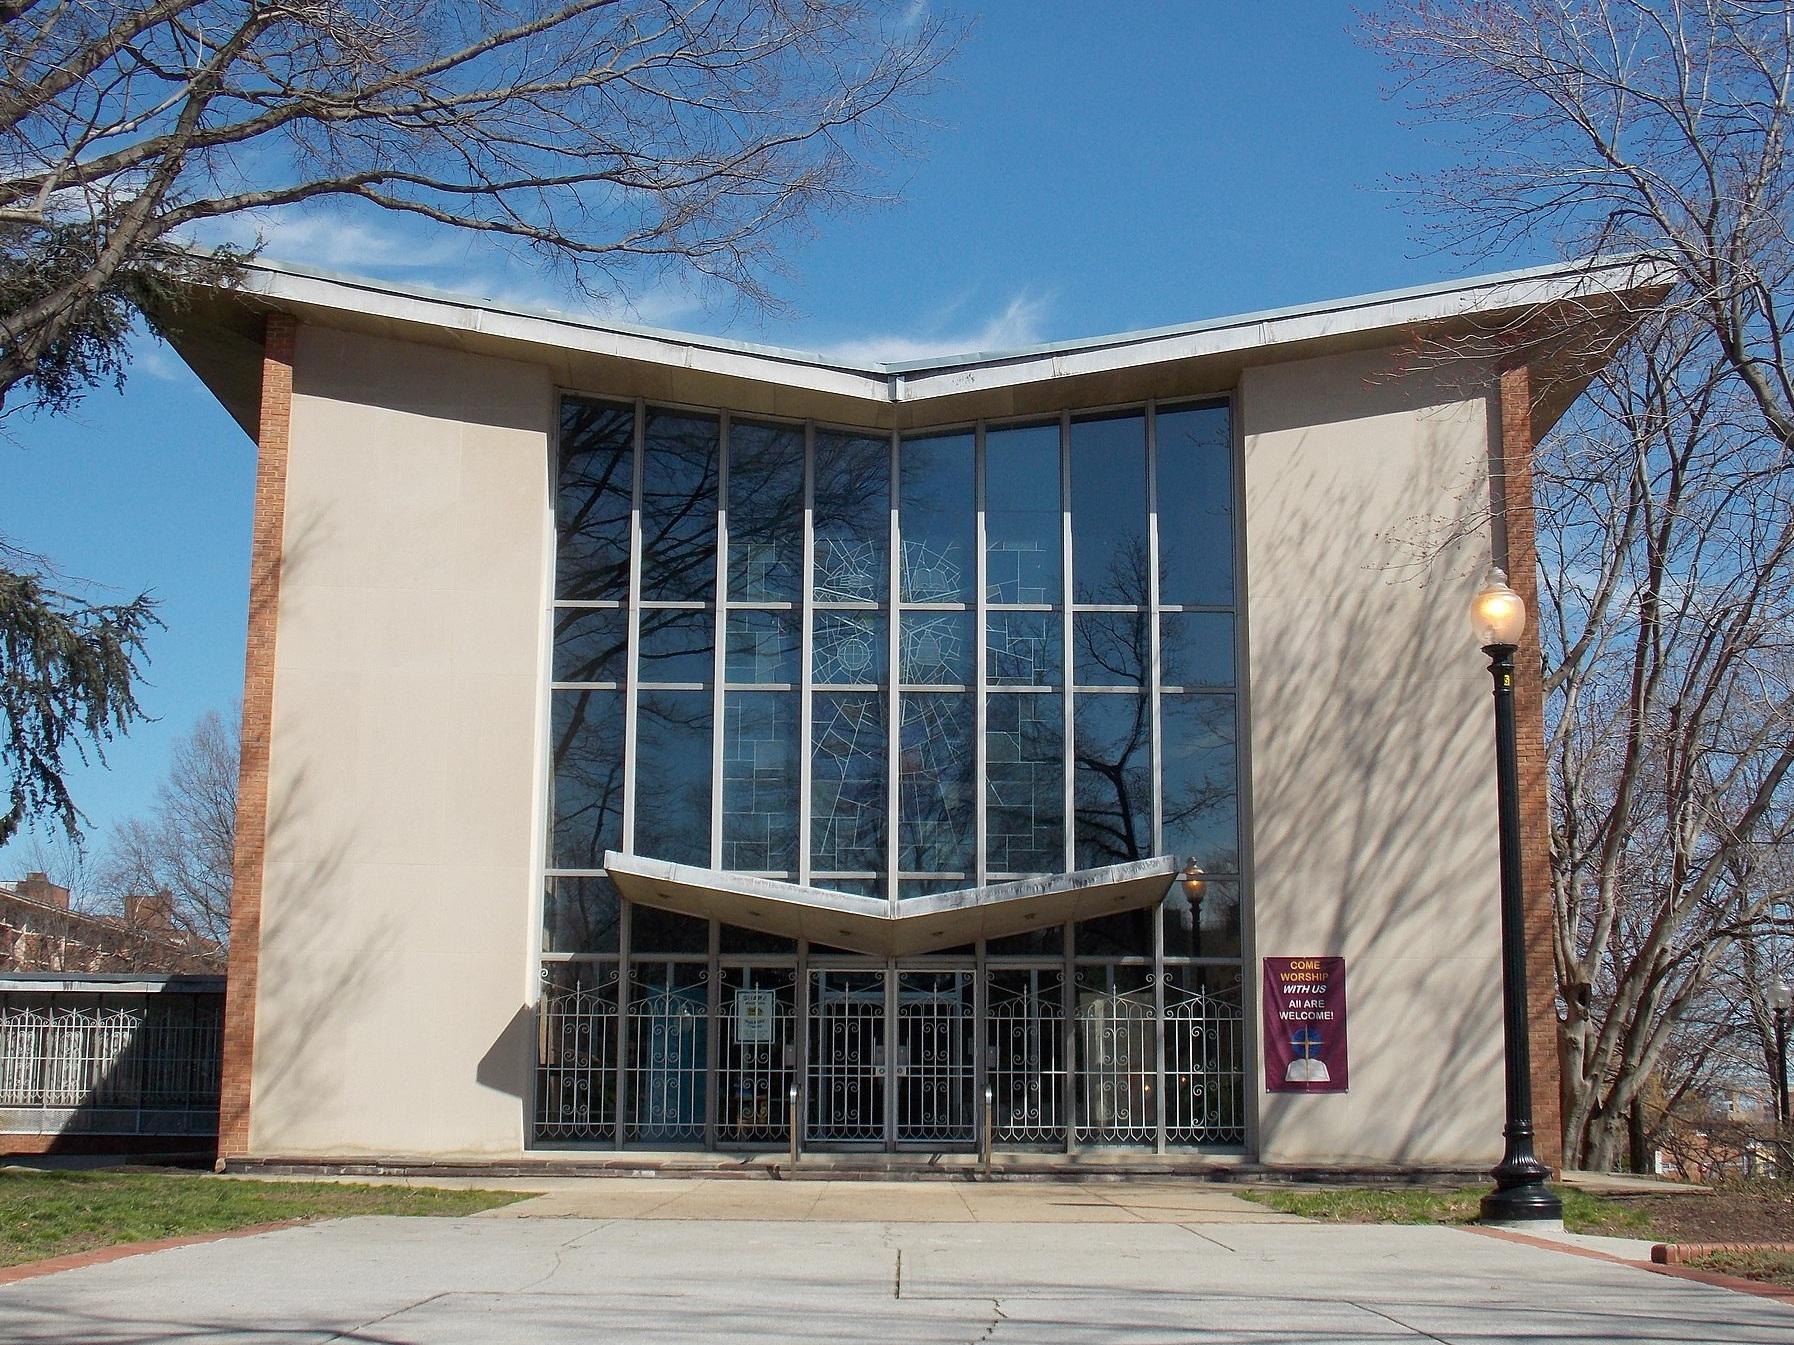 Christ UMC, District of Columbia. Photo credit: Creative Commons, Farragutful